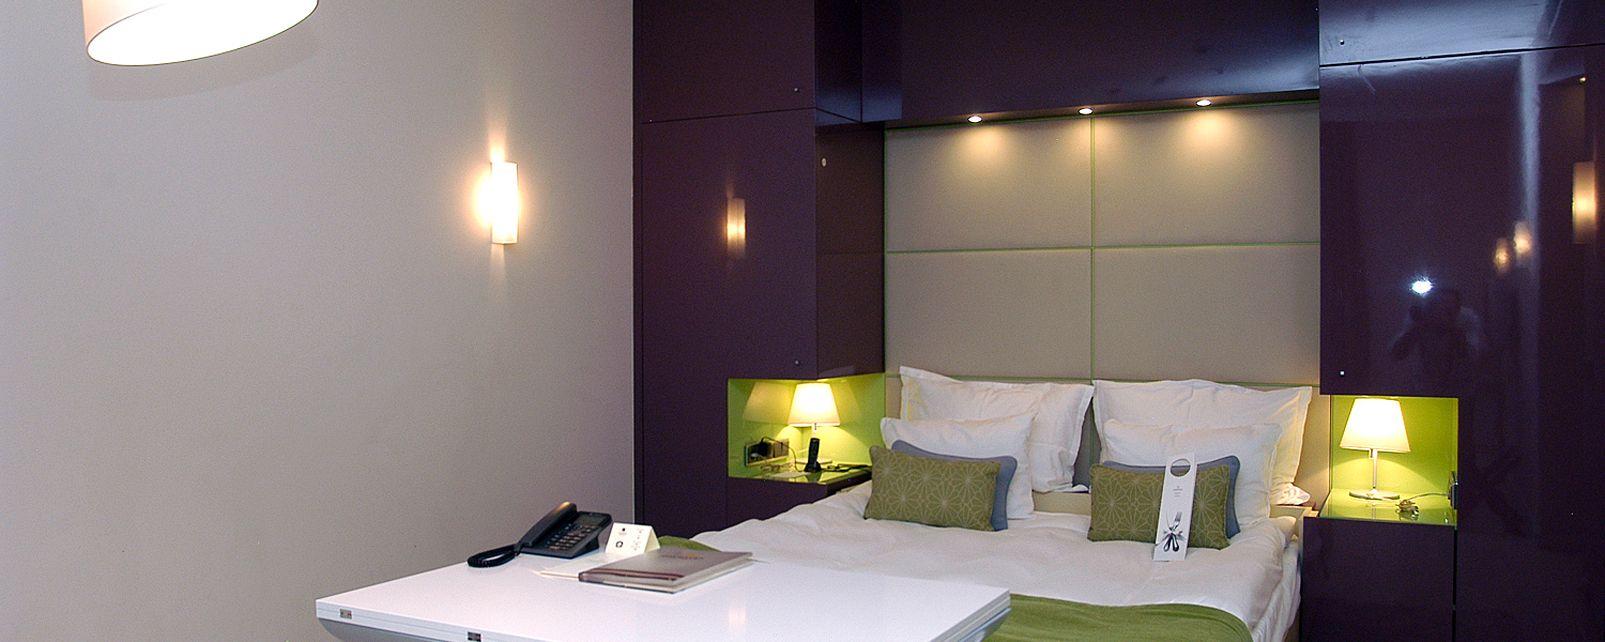 Hotel MaMaison Pokrovka Suite